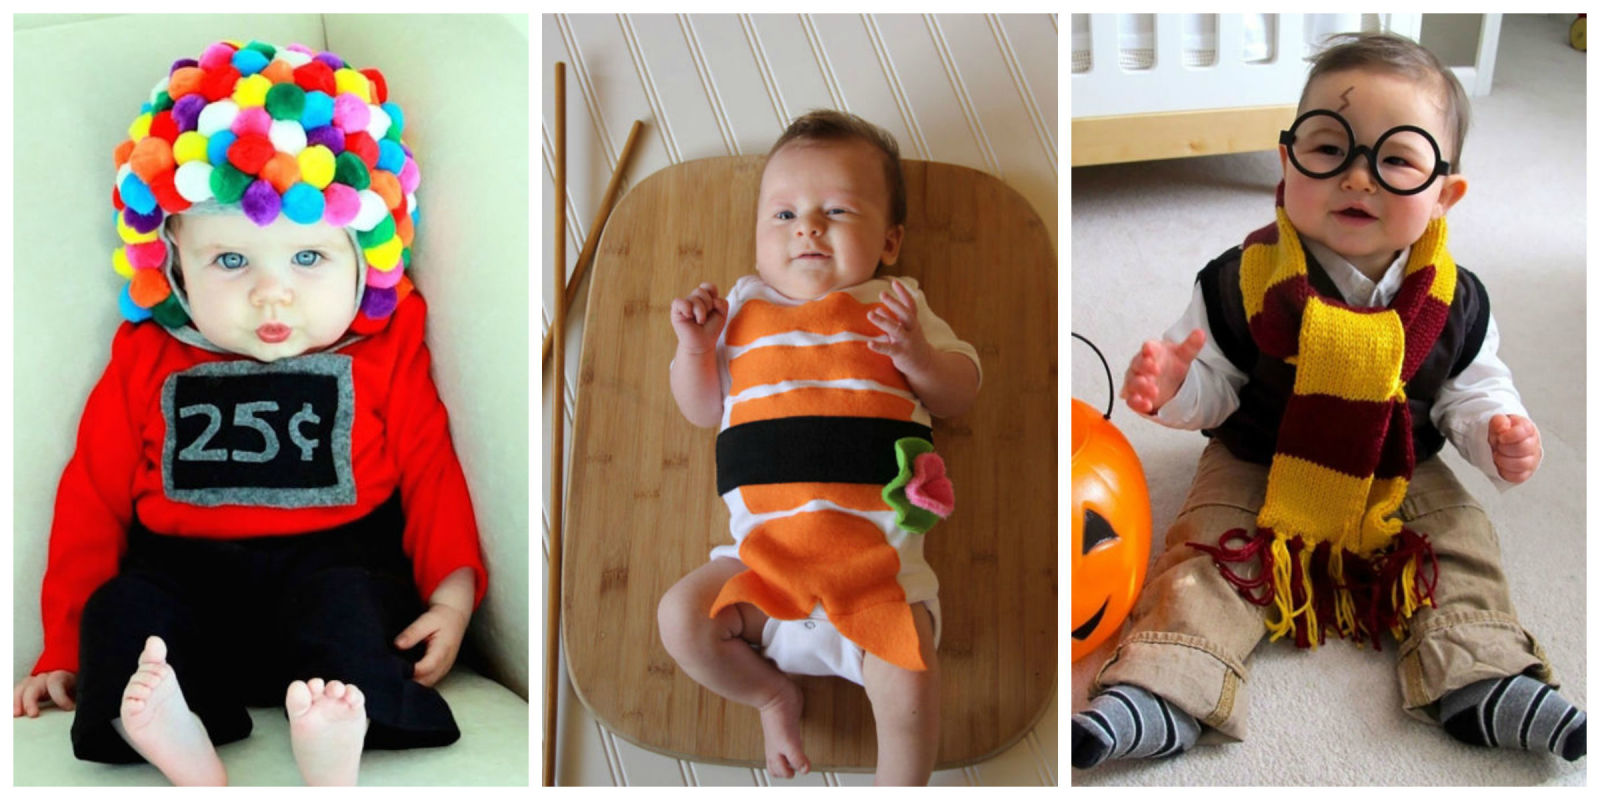 cute diy baby halloween costume ideas best homemade infant halloween costumes - Diy Halloween Baby Costumes